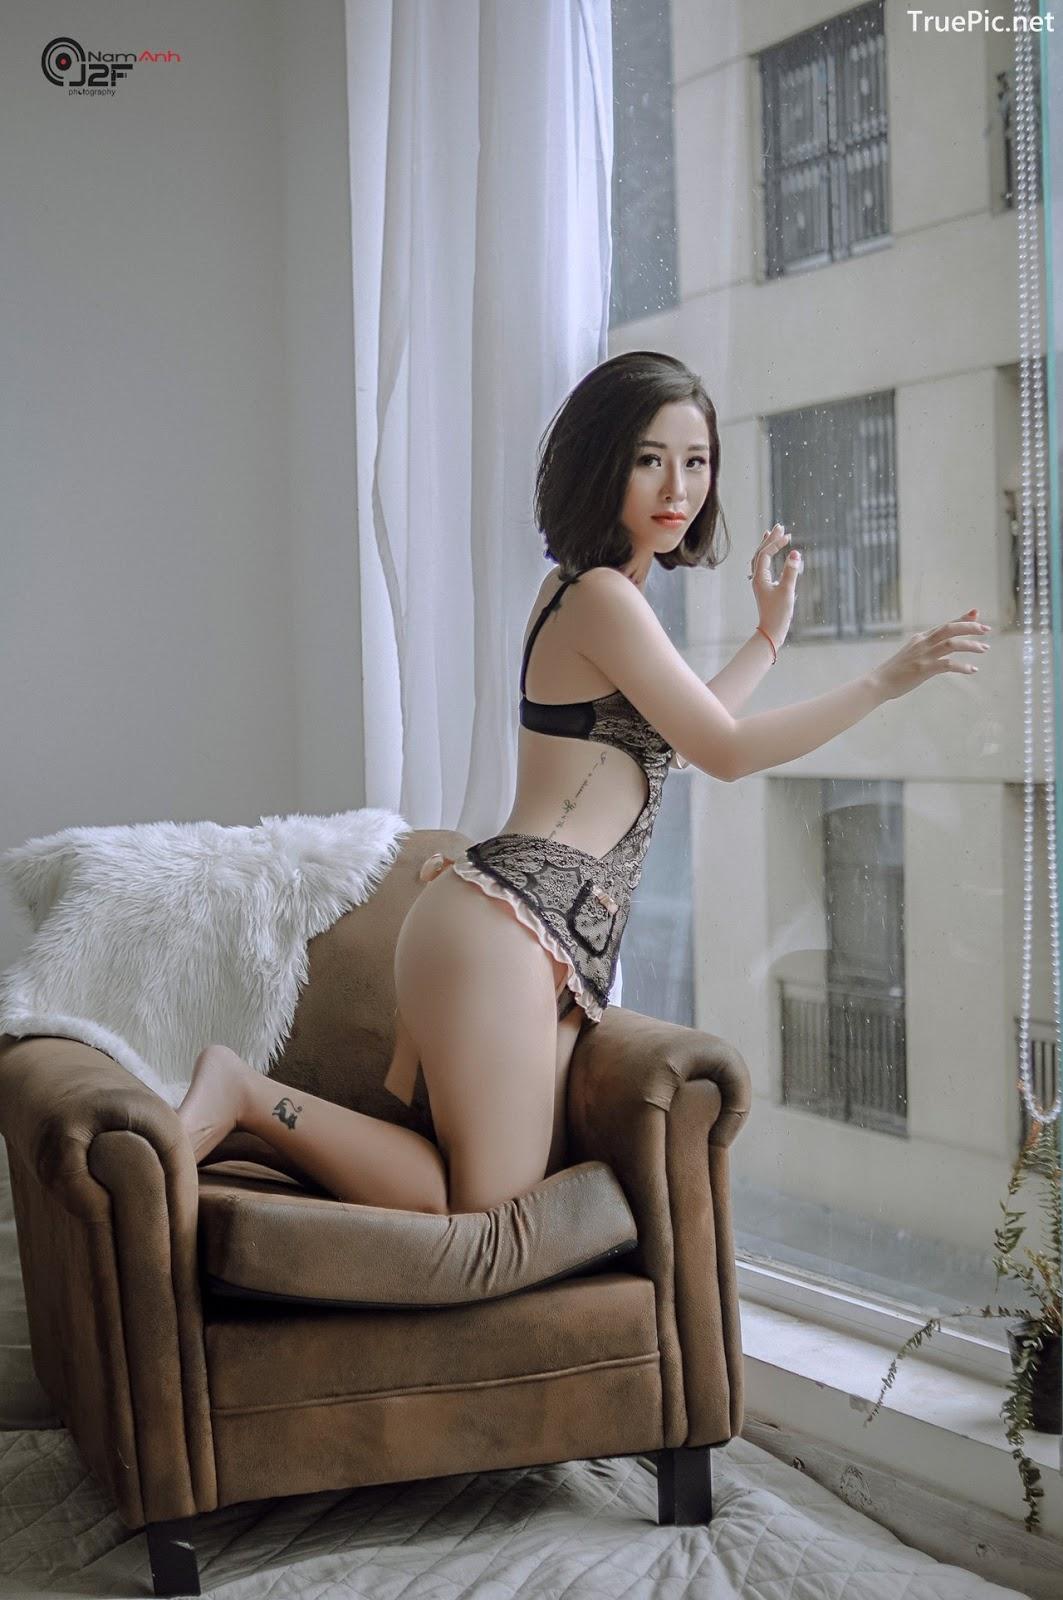 Image Vietnamese Model – Sexy Beauty of Beautiful Girls Taken by NamAnh Photo #6 - TruePic.net - Picture-4